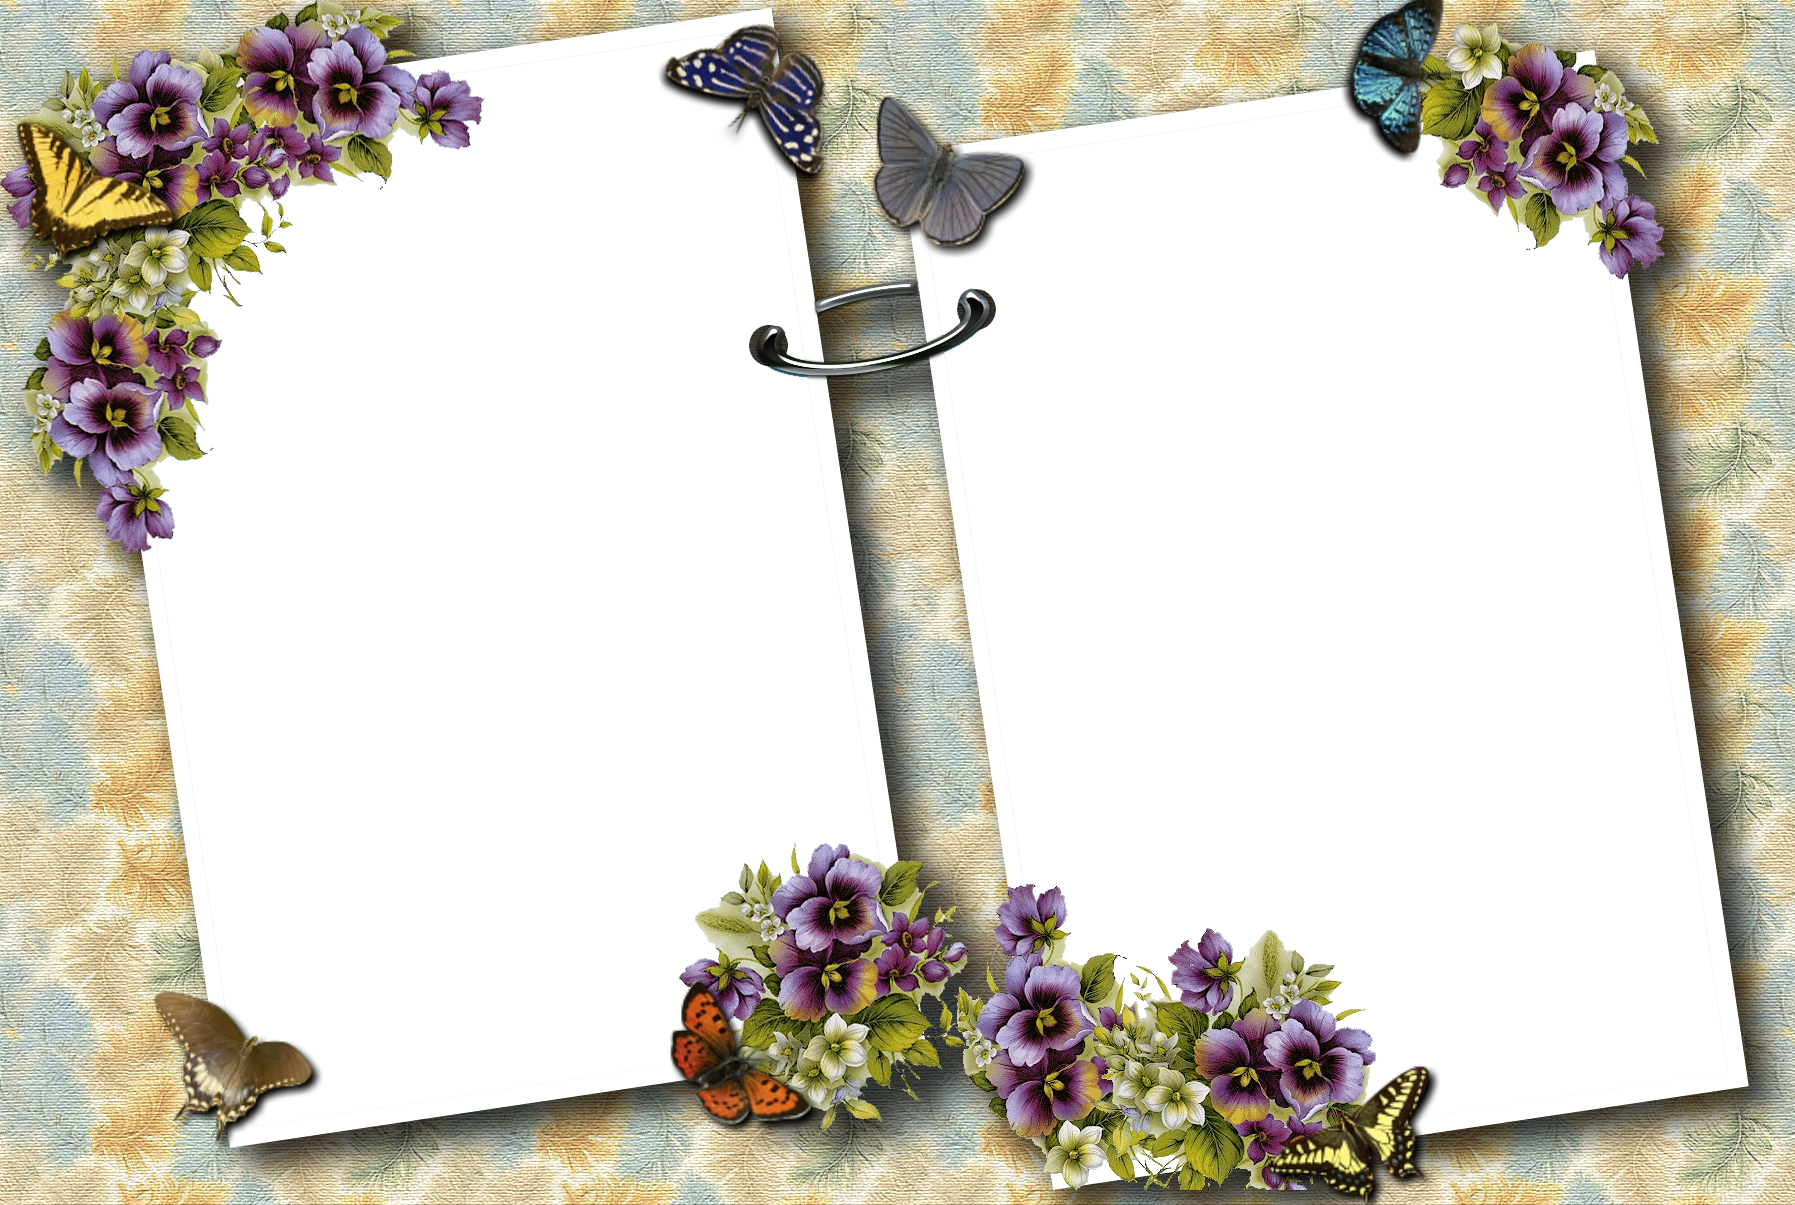 Transparent butterflies photo yopriceville. Clipart gallery photograph frame